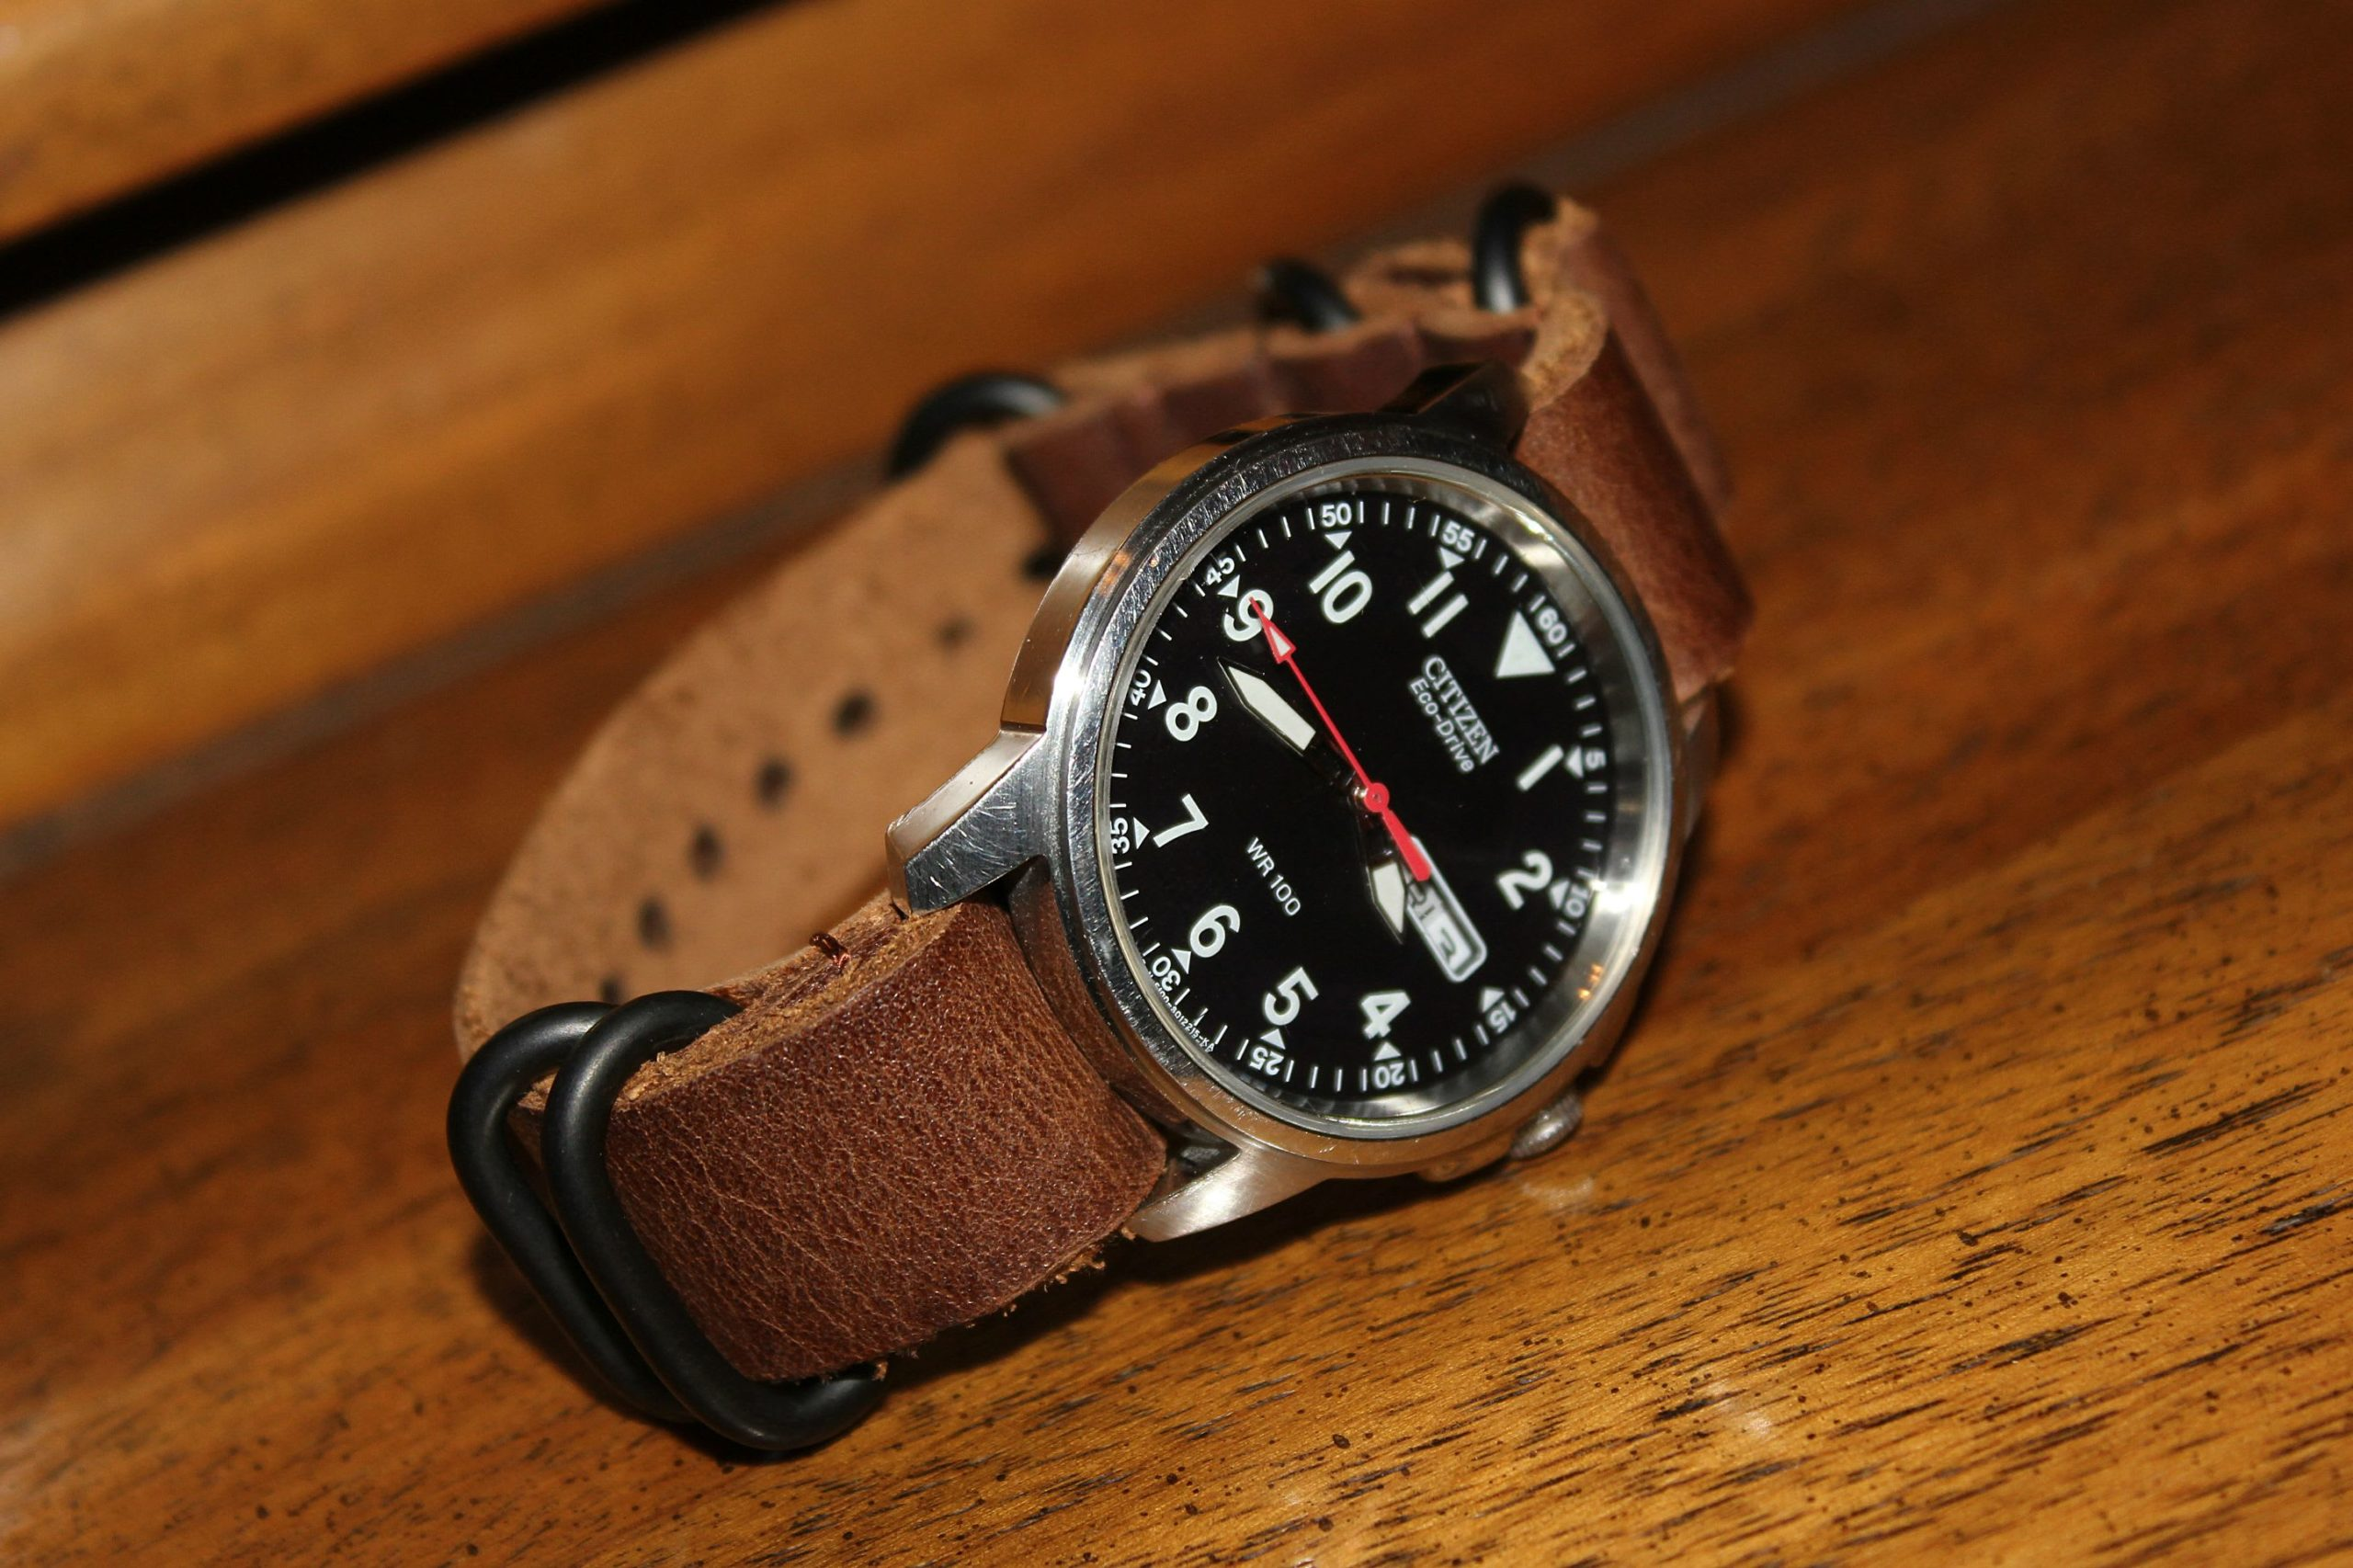 Original Citizen Eco-Drive watch